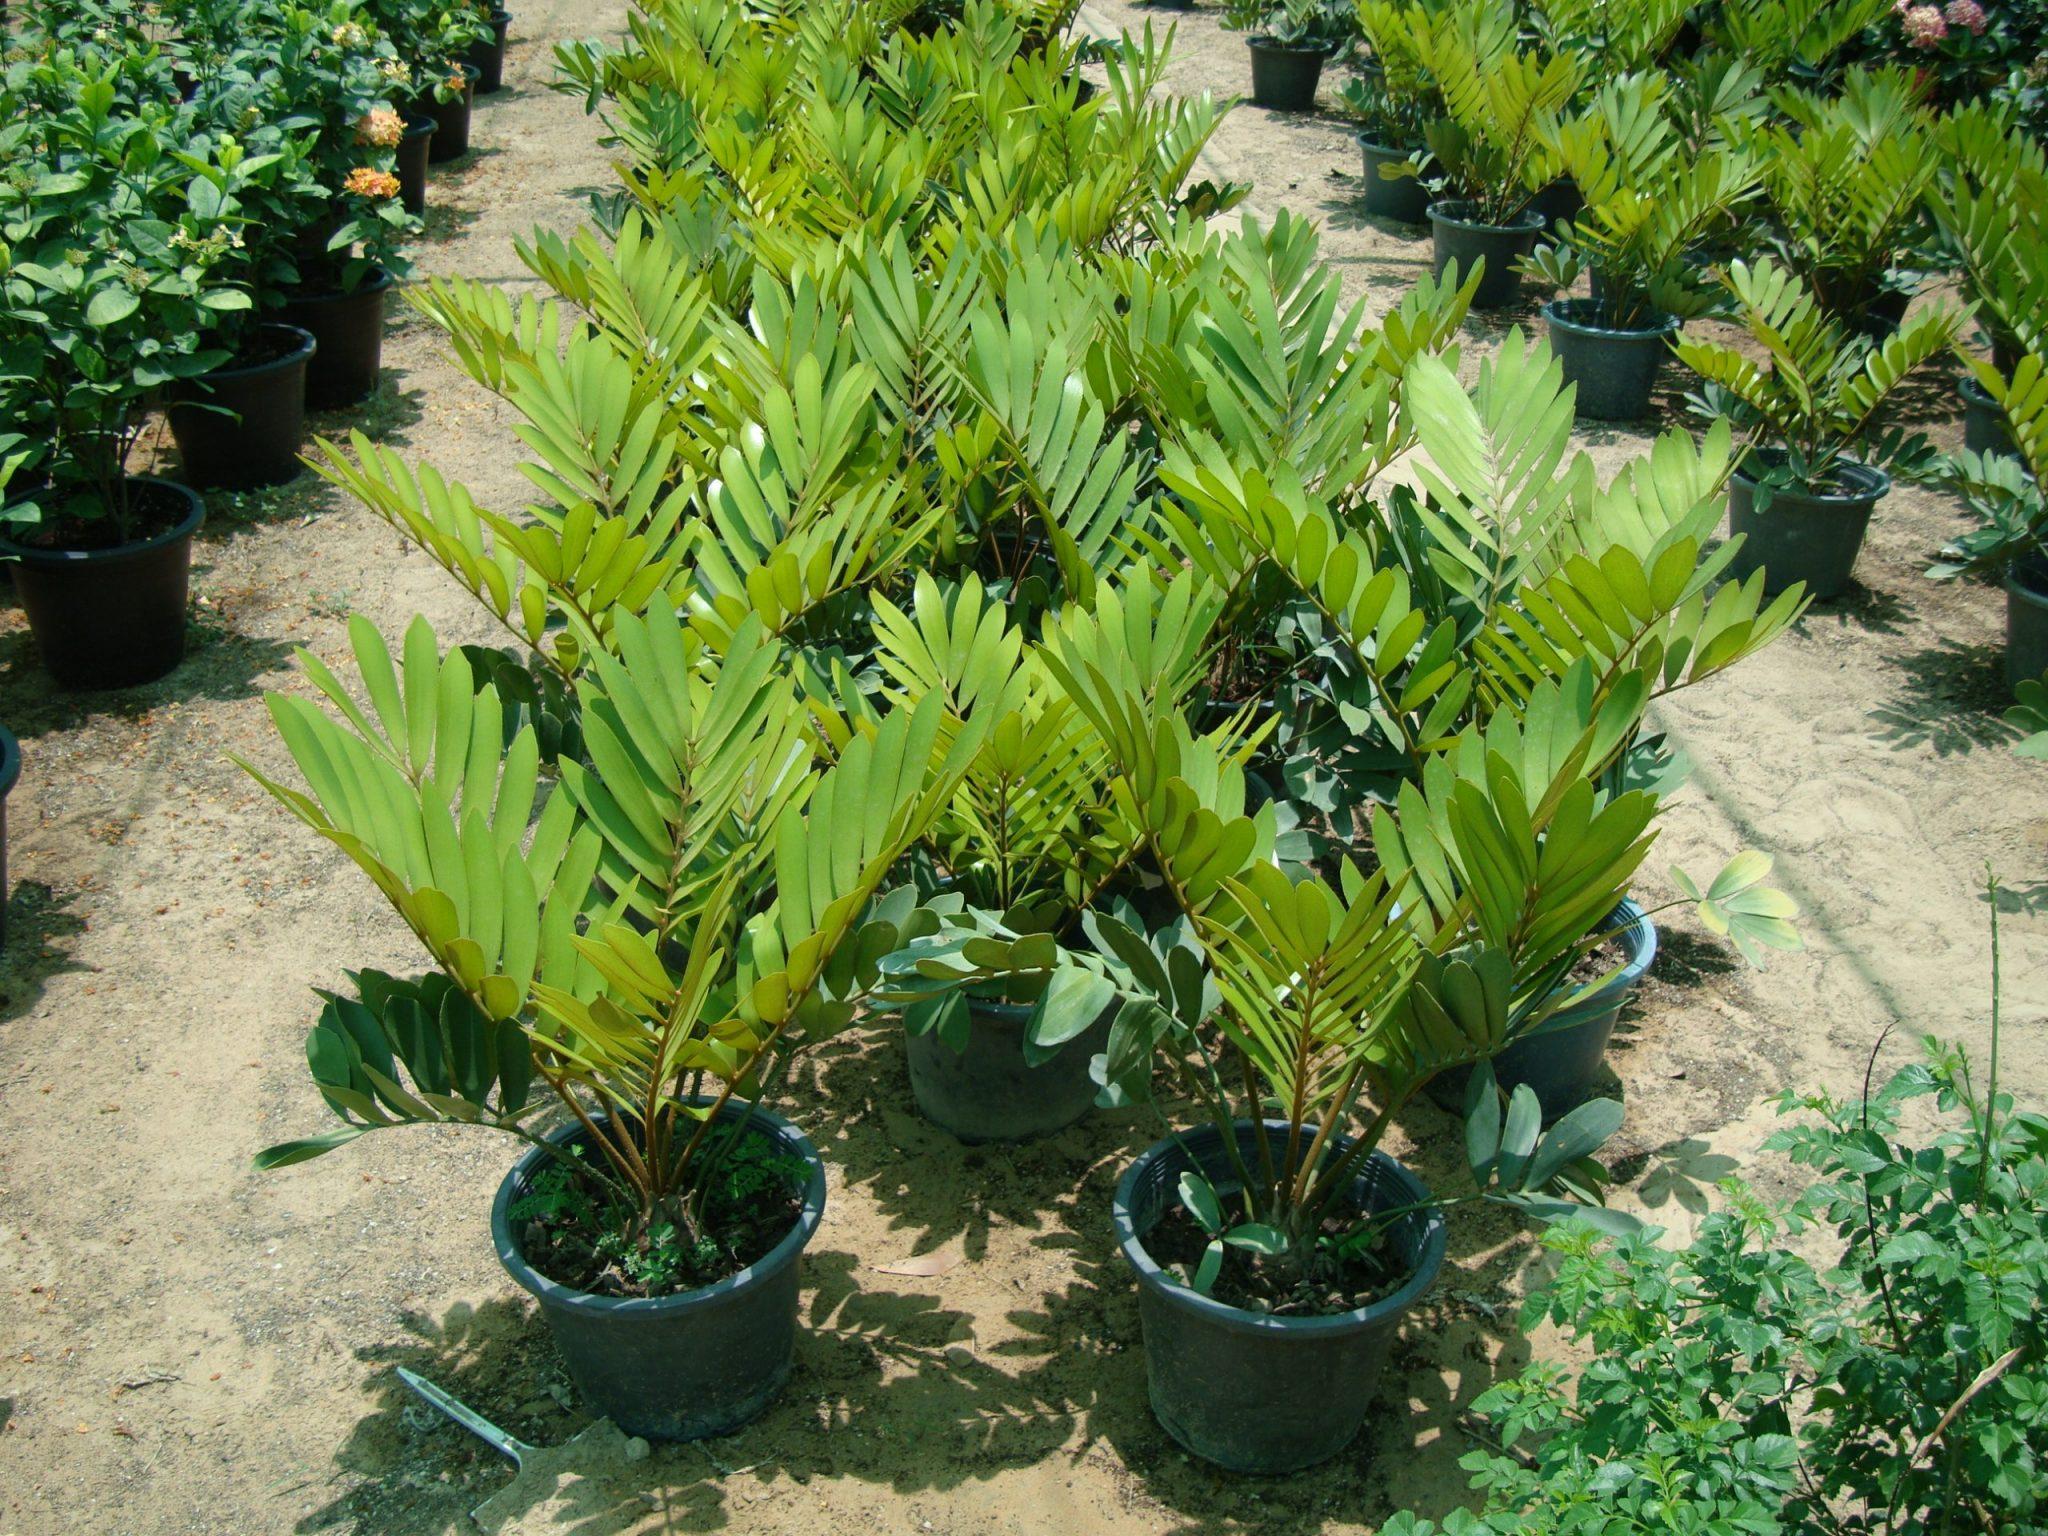 Zamia furfuracea, Cardboard palm